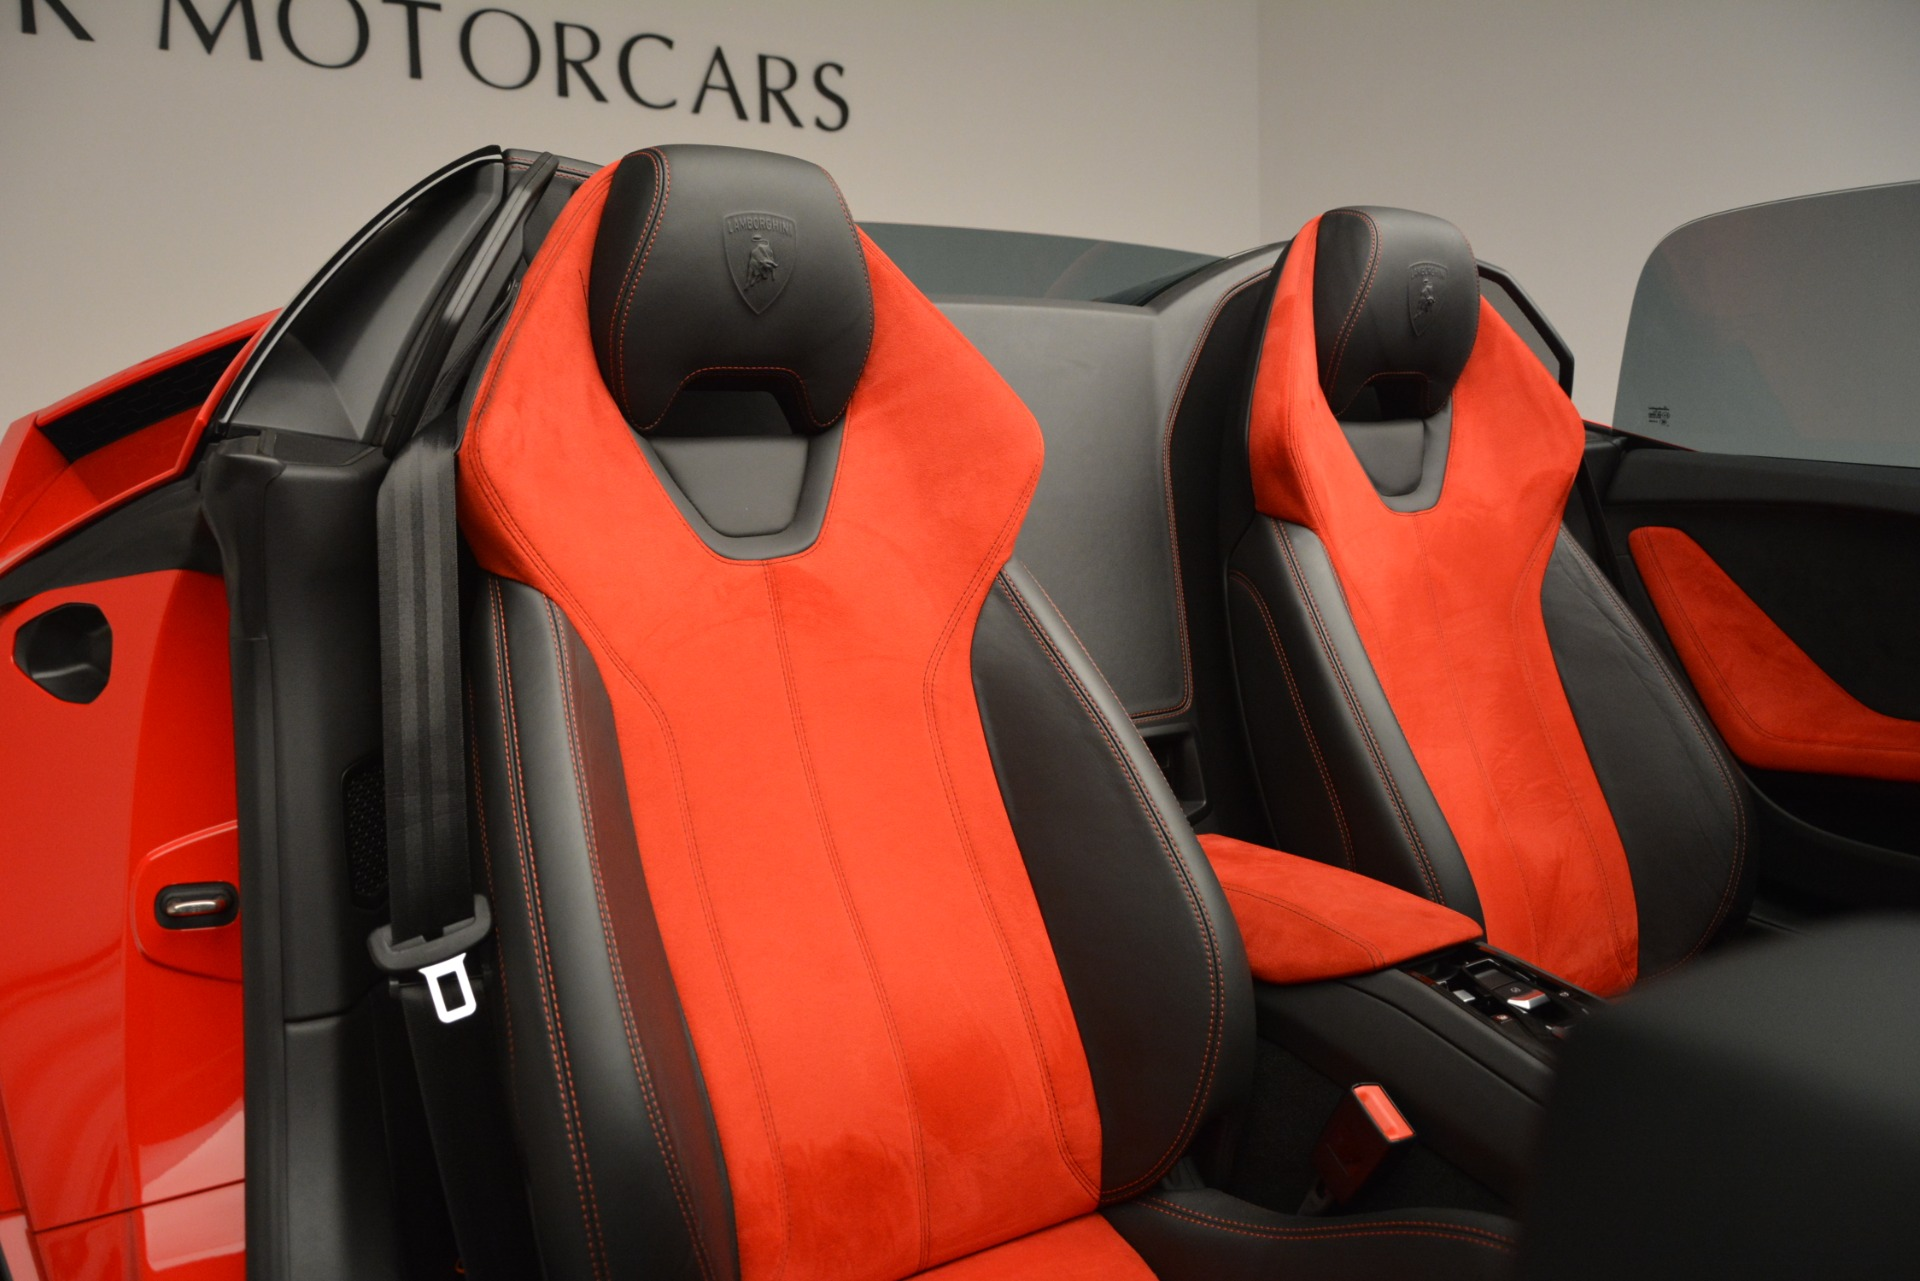 Used 2017 Lamborghini Huracan LP 610 4 Spyder